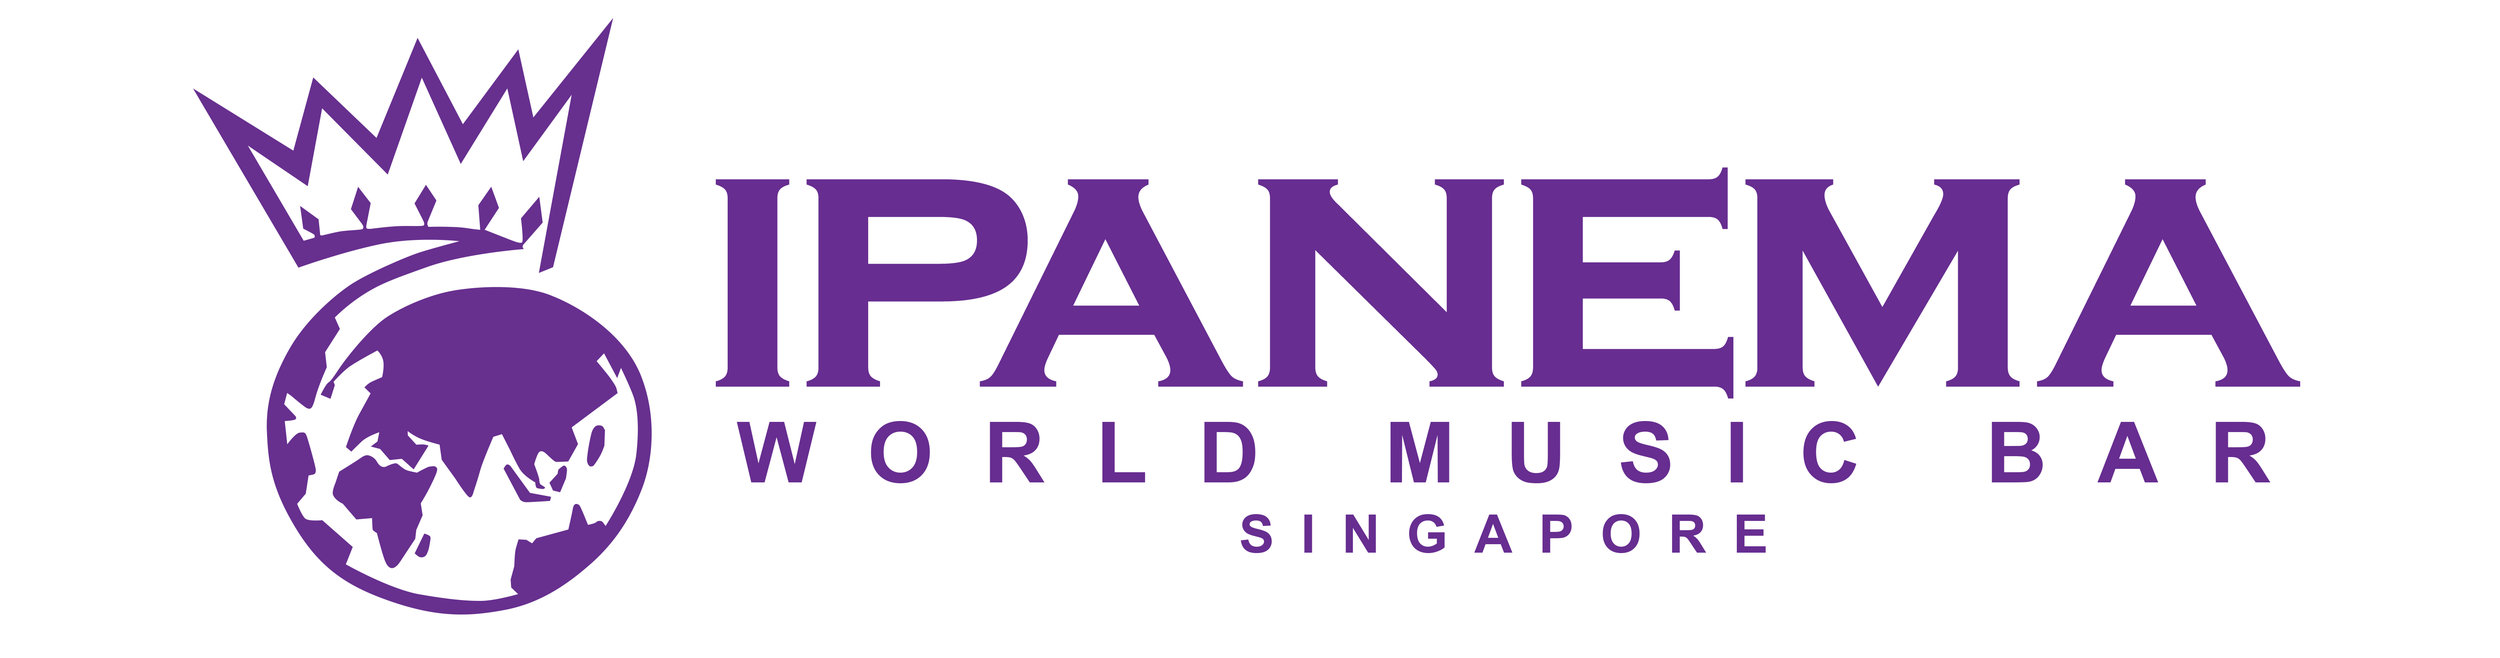 ipanema-logo.jpg